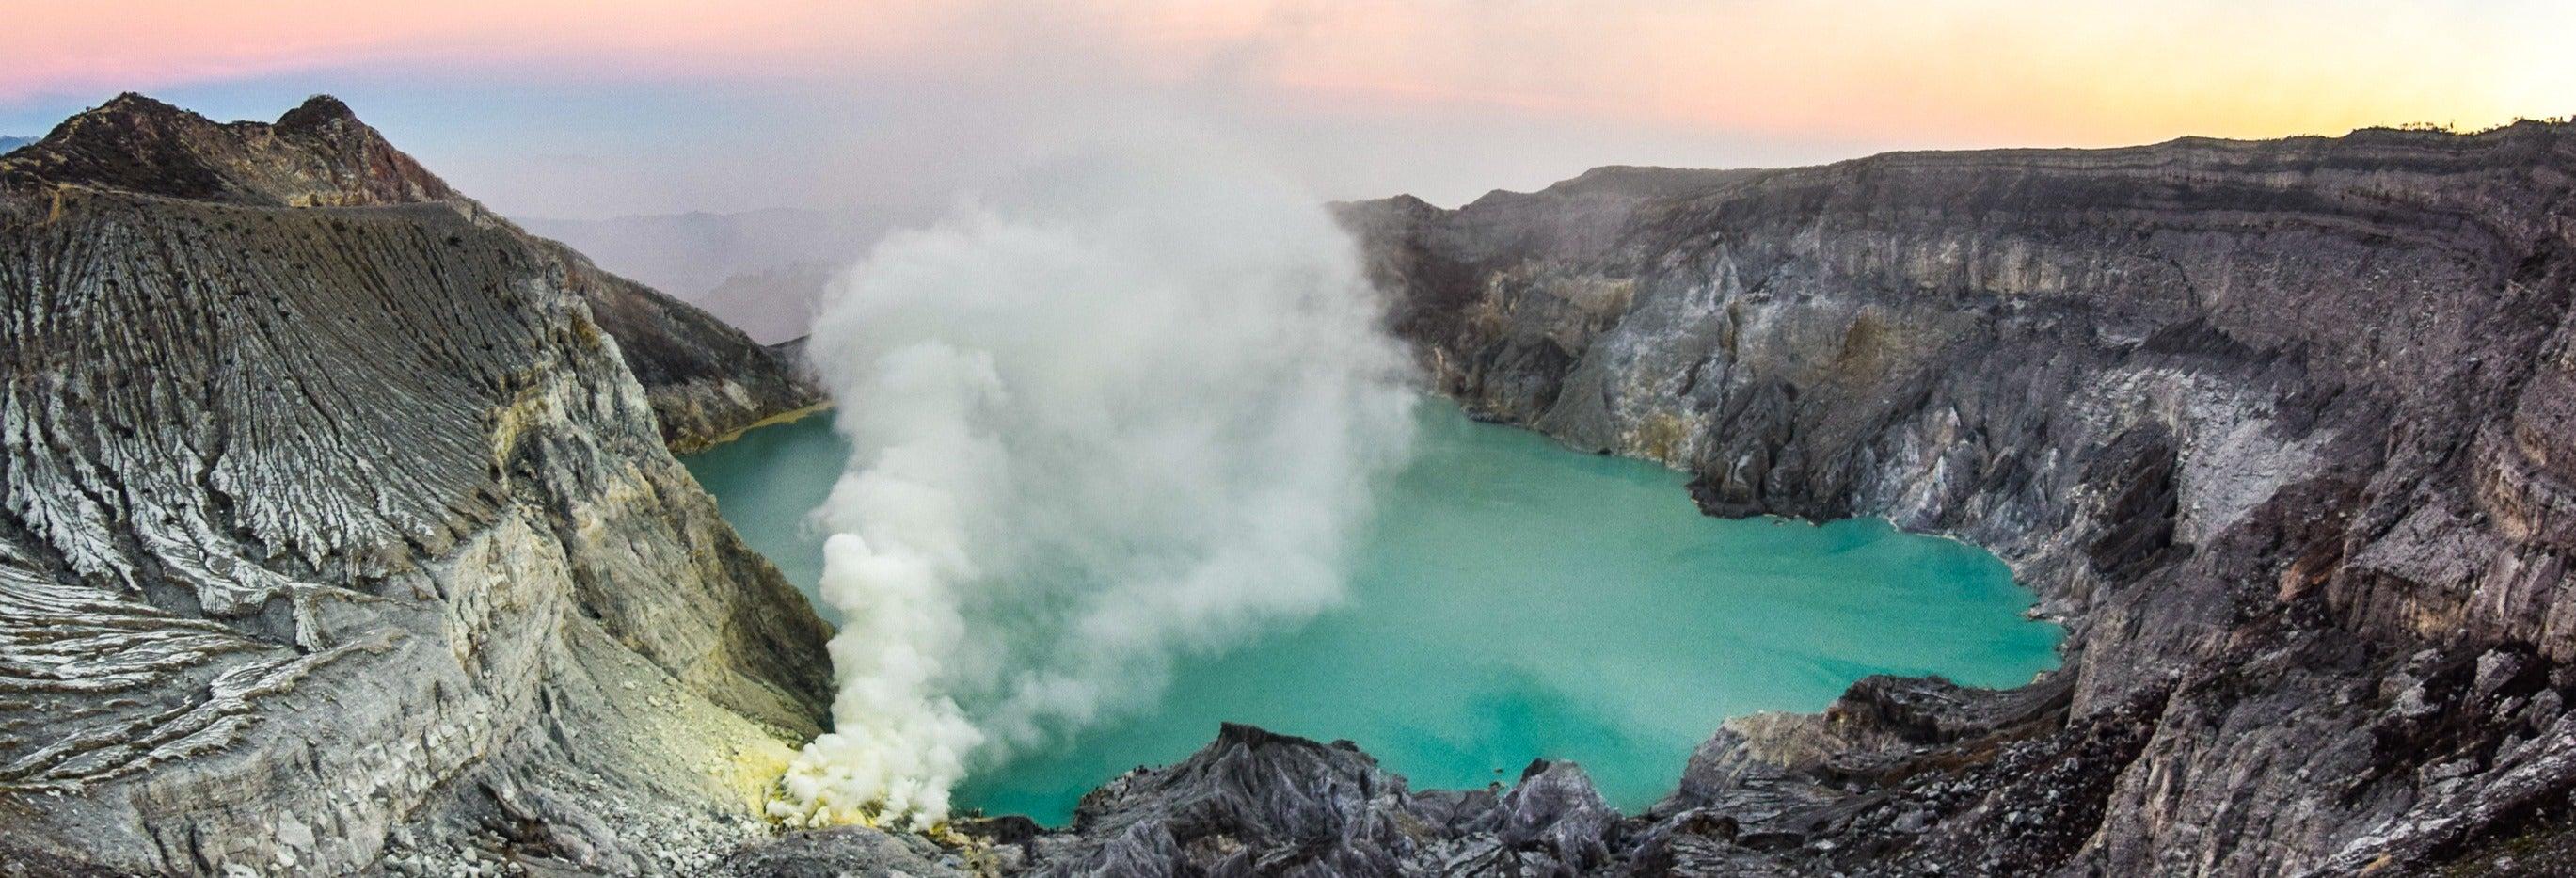 East Java Volcano Tour: 3 Days from Surabaya to Bali